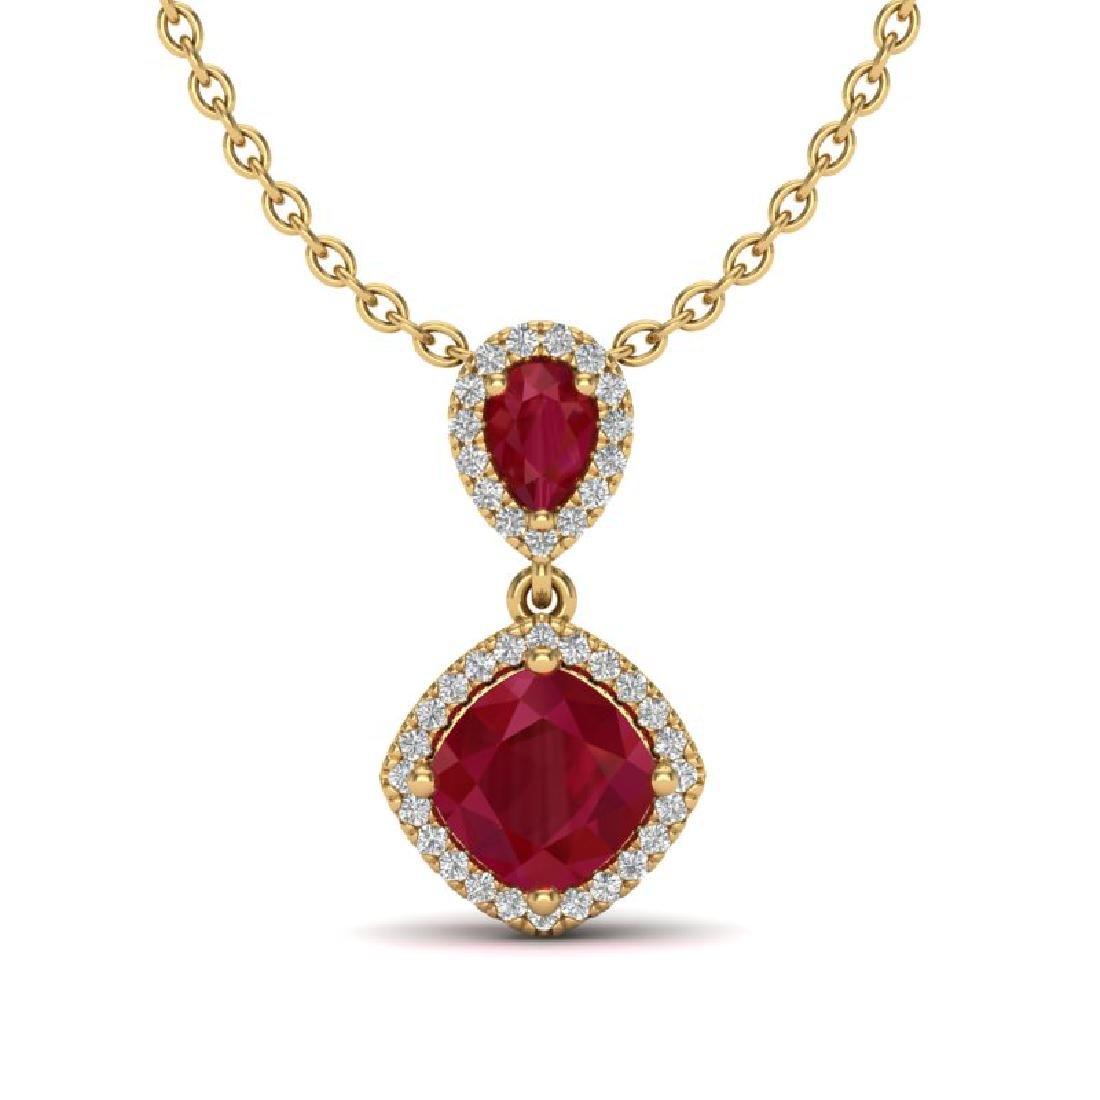 3.50 CTW Ruby & Micro Pave VS/SI Diamond Necklace Halo